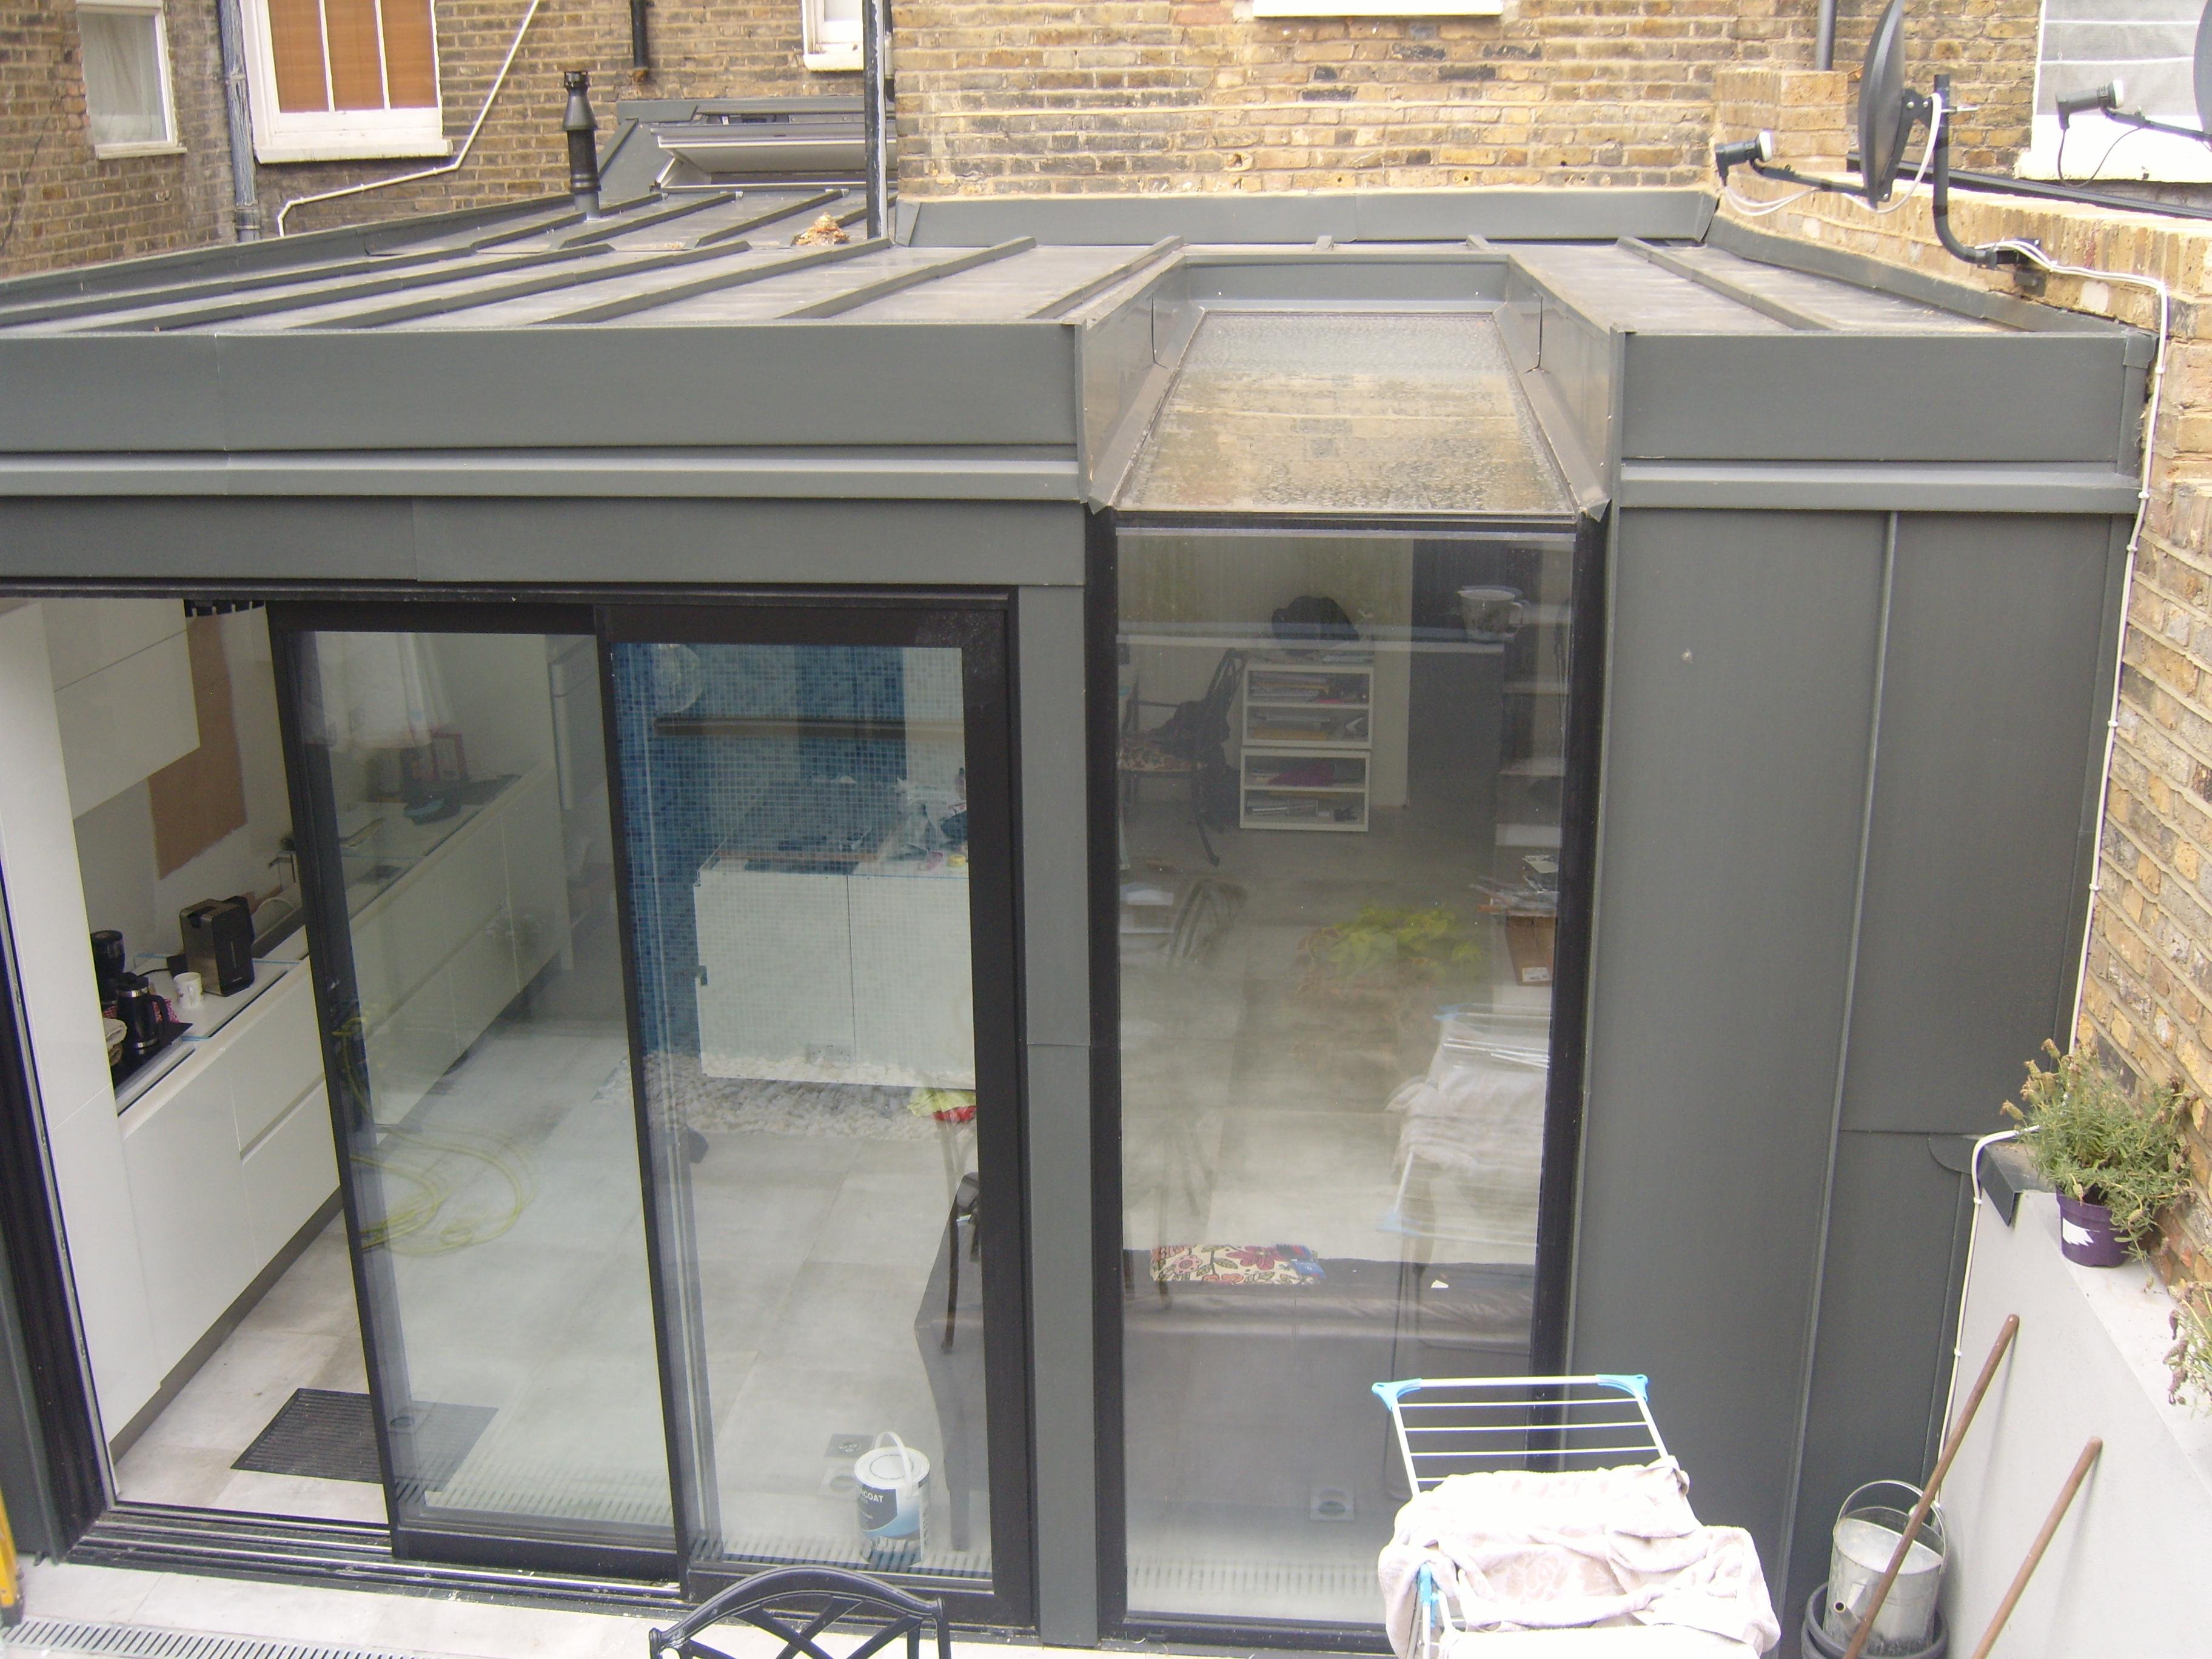 Chelsea_zinc_roof_London